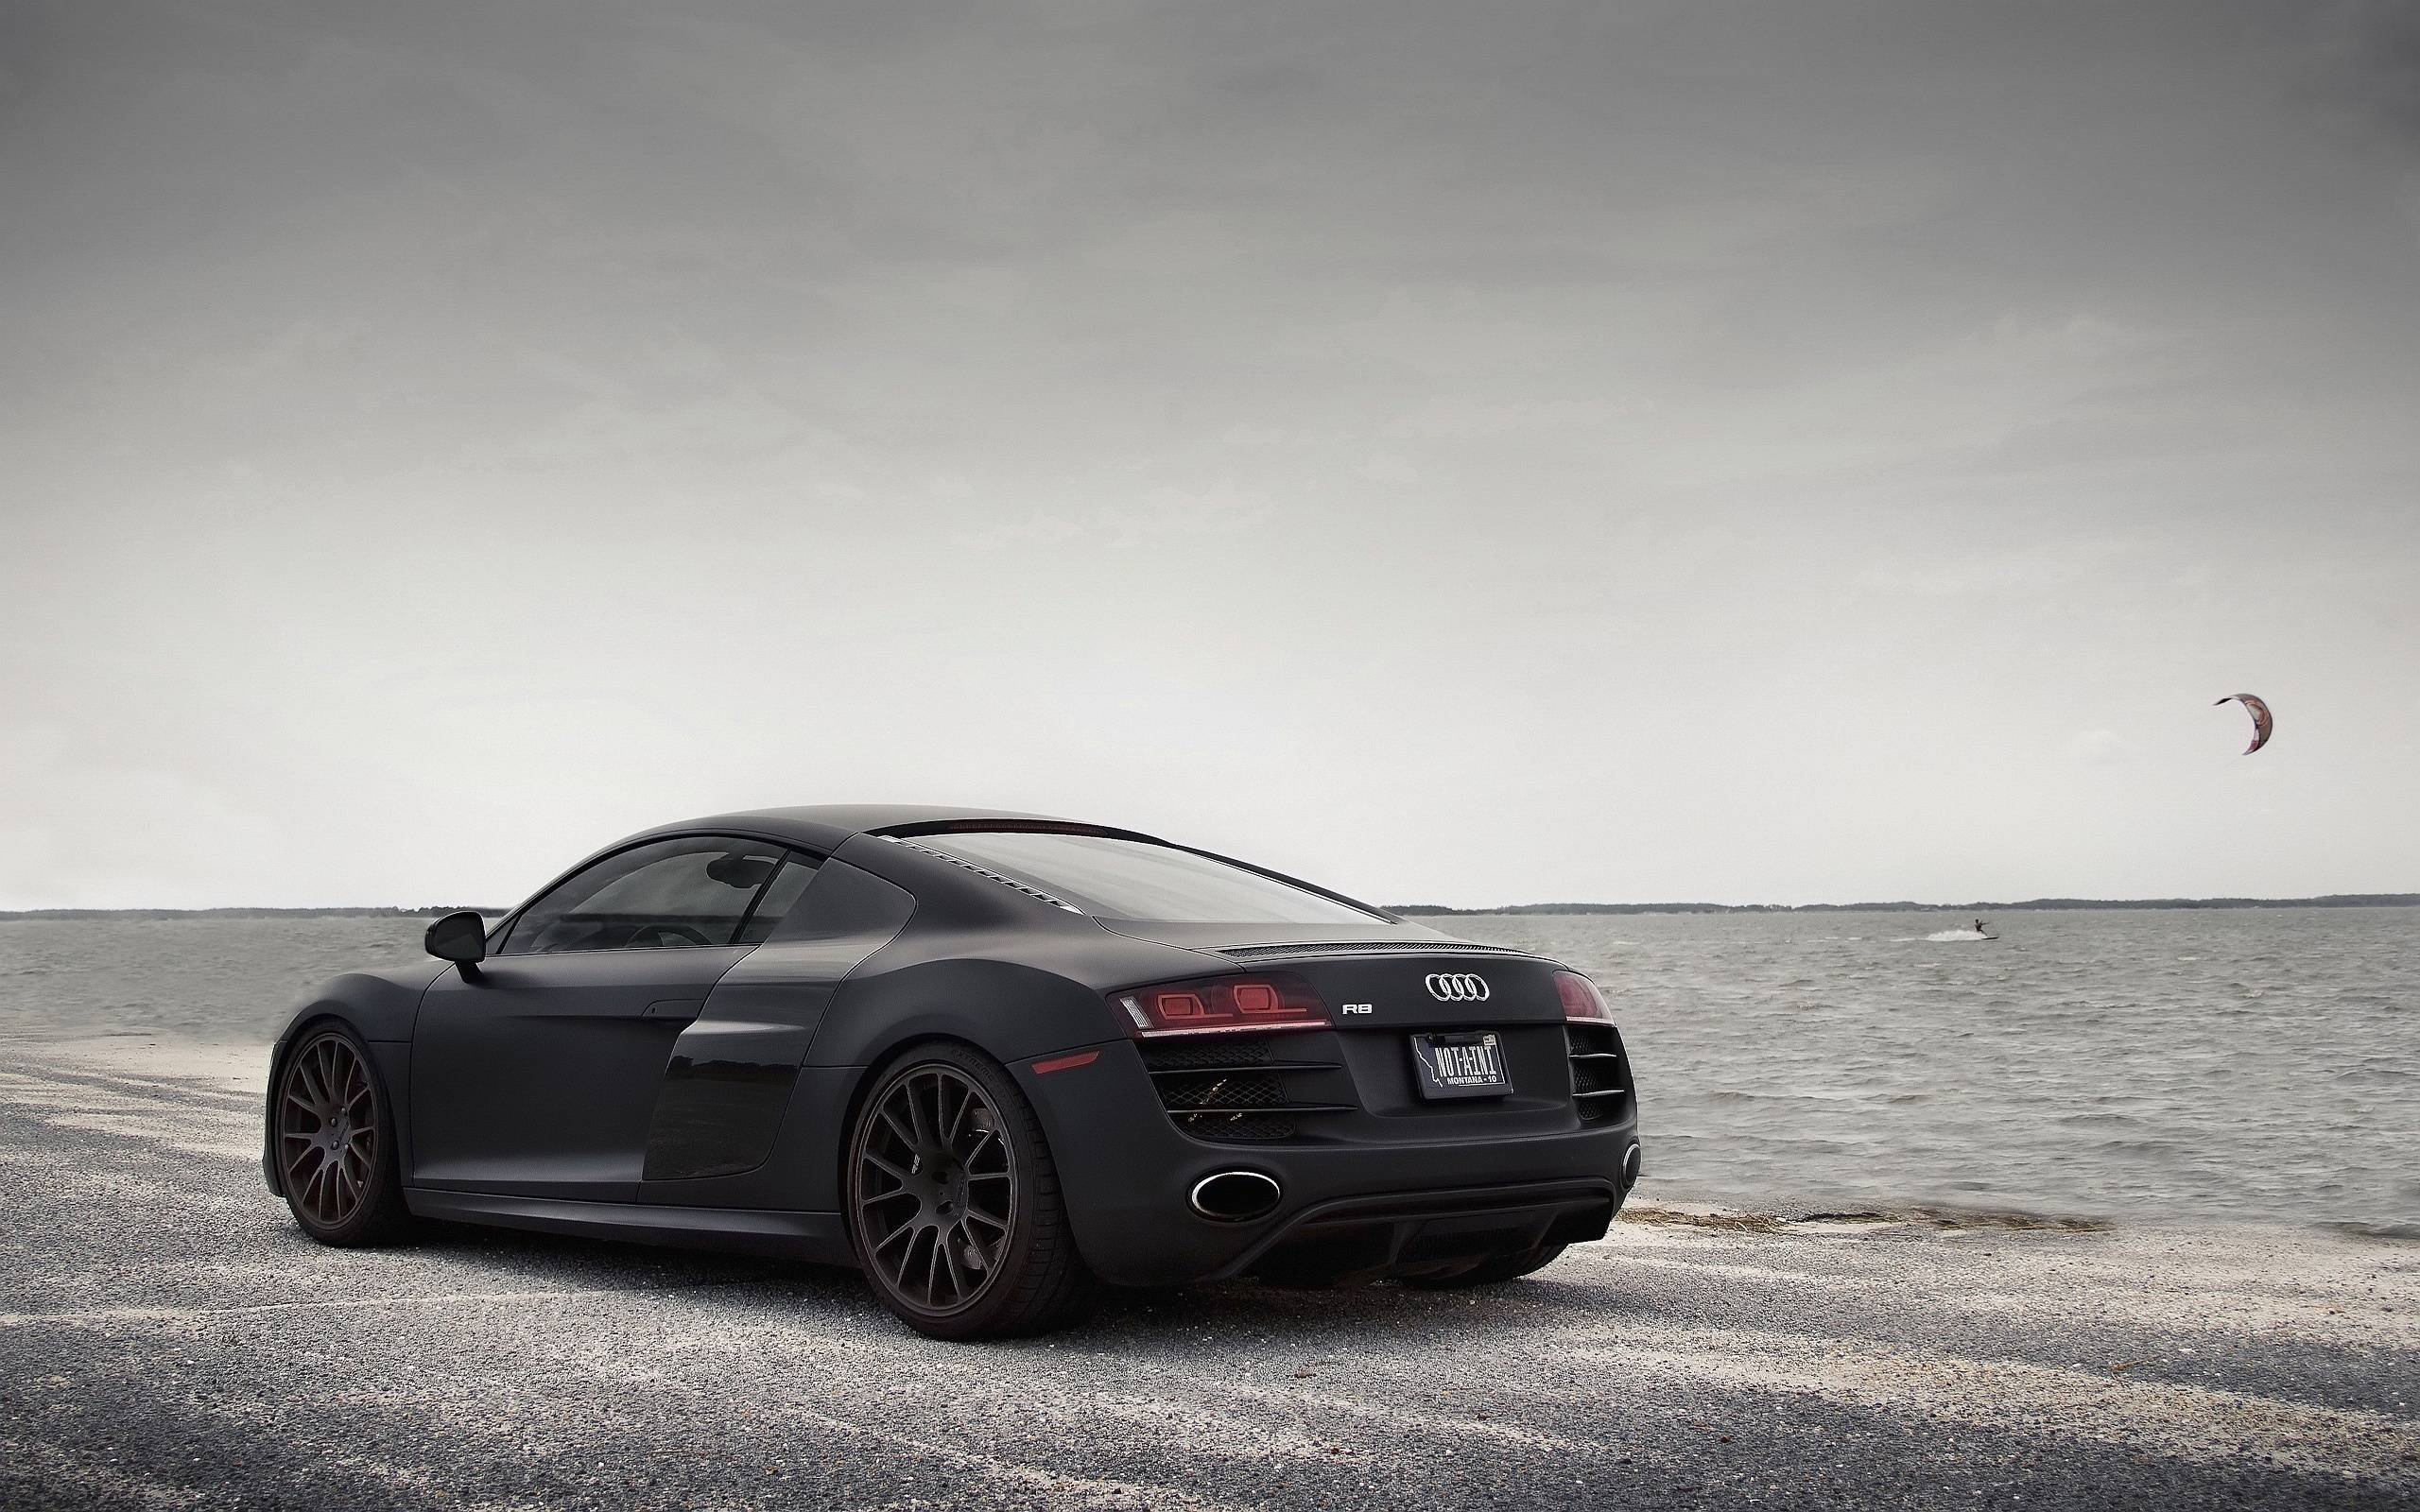 Audi R8 Black Wallpapers Top Free Audi R8 Black Backgrounds Wallpaperaccess